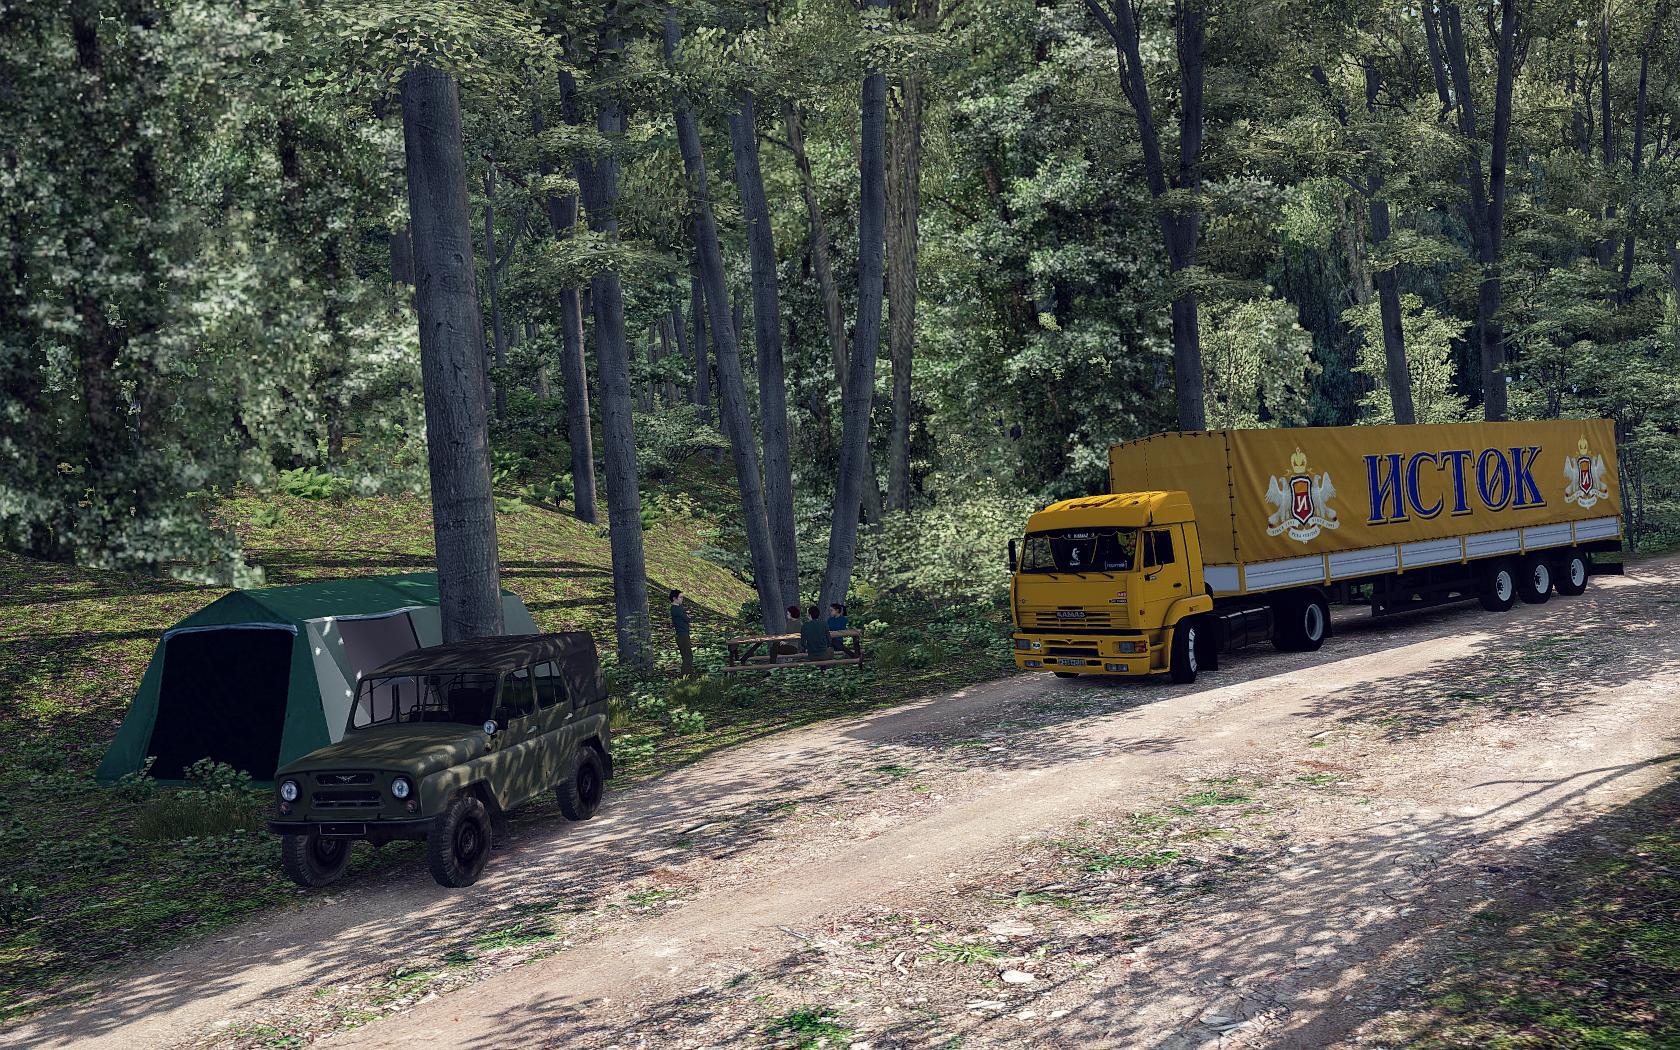 Камаз 5460 - Euro Truck Simulator 2 1.28, Исток, Нефаз, Транспорт